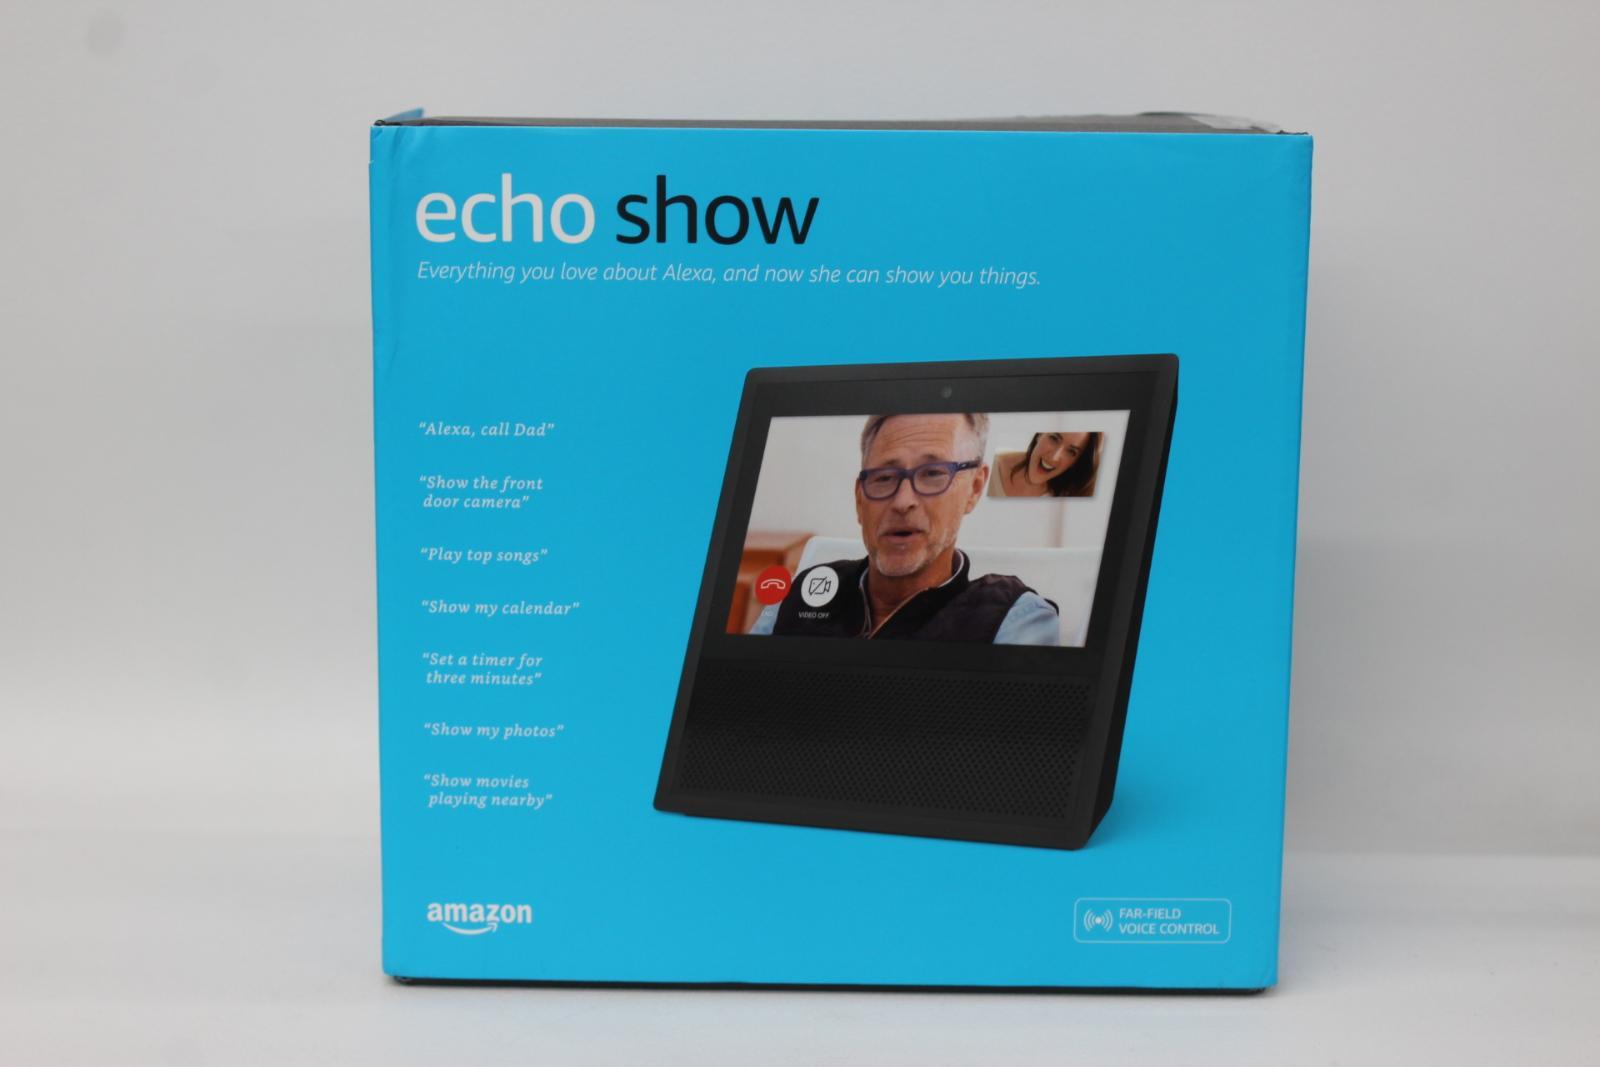 AMAZON-Echo-Show-Alexa-Smart-Assistant-Black-1st-Generation-7-034-Display-NEW thumbnail 2